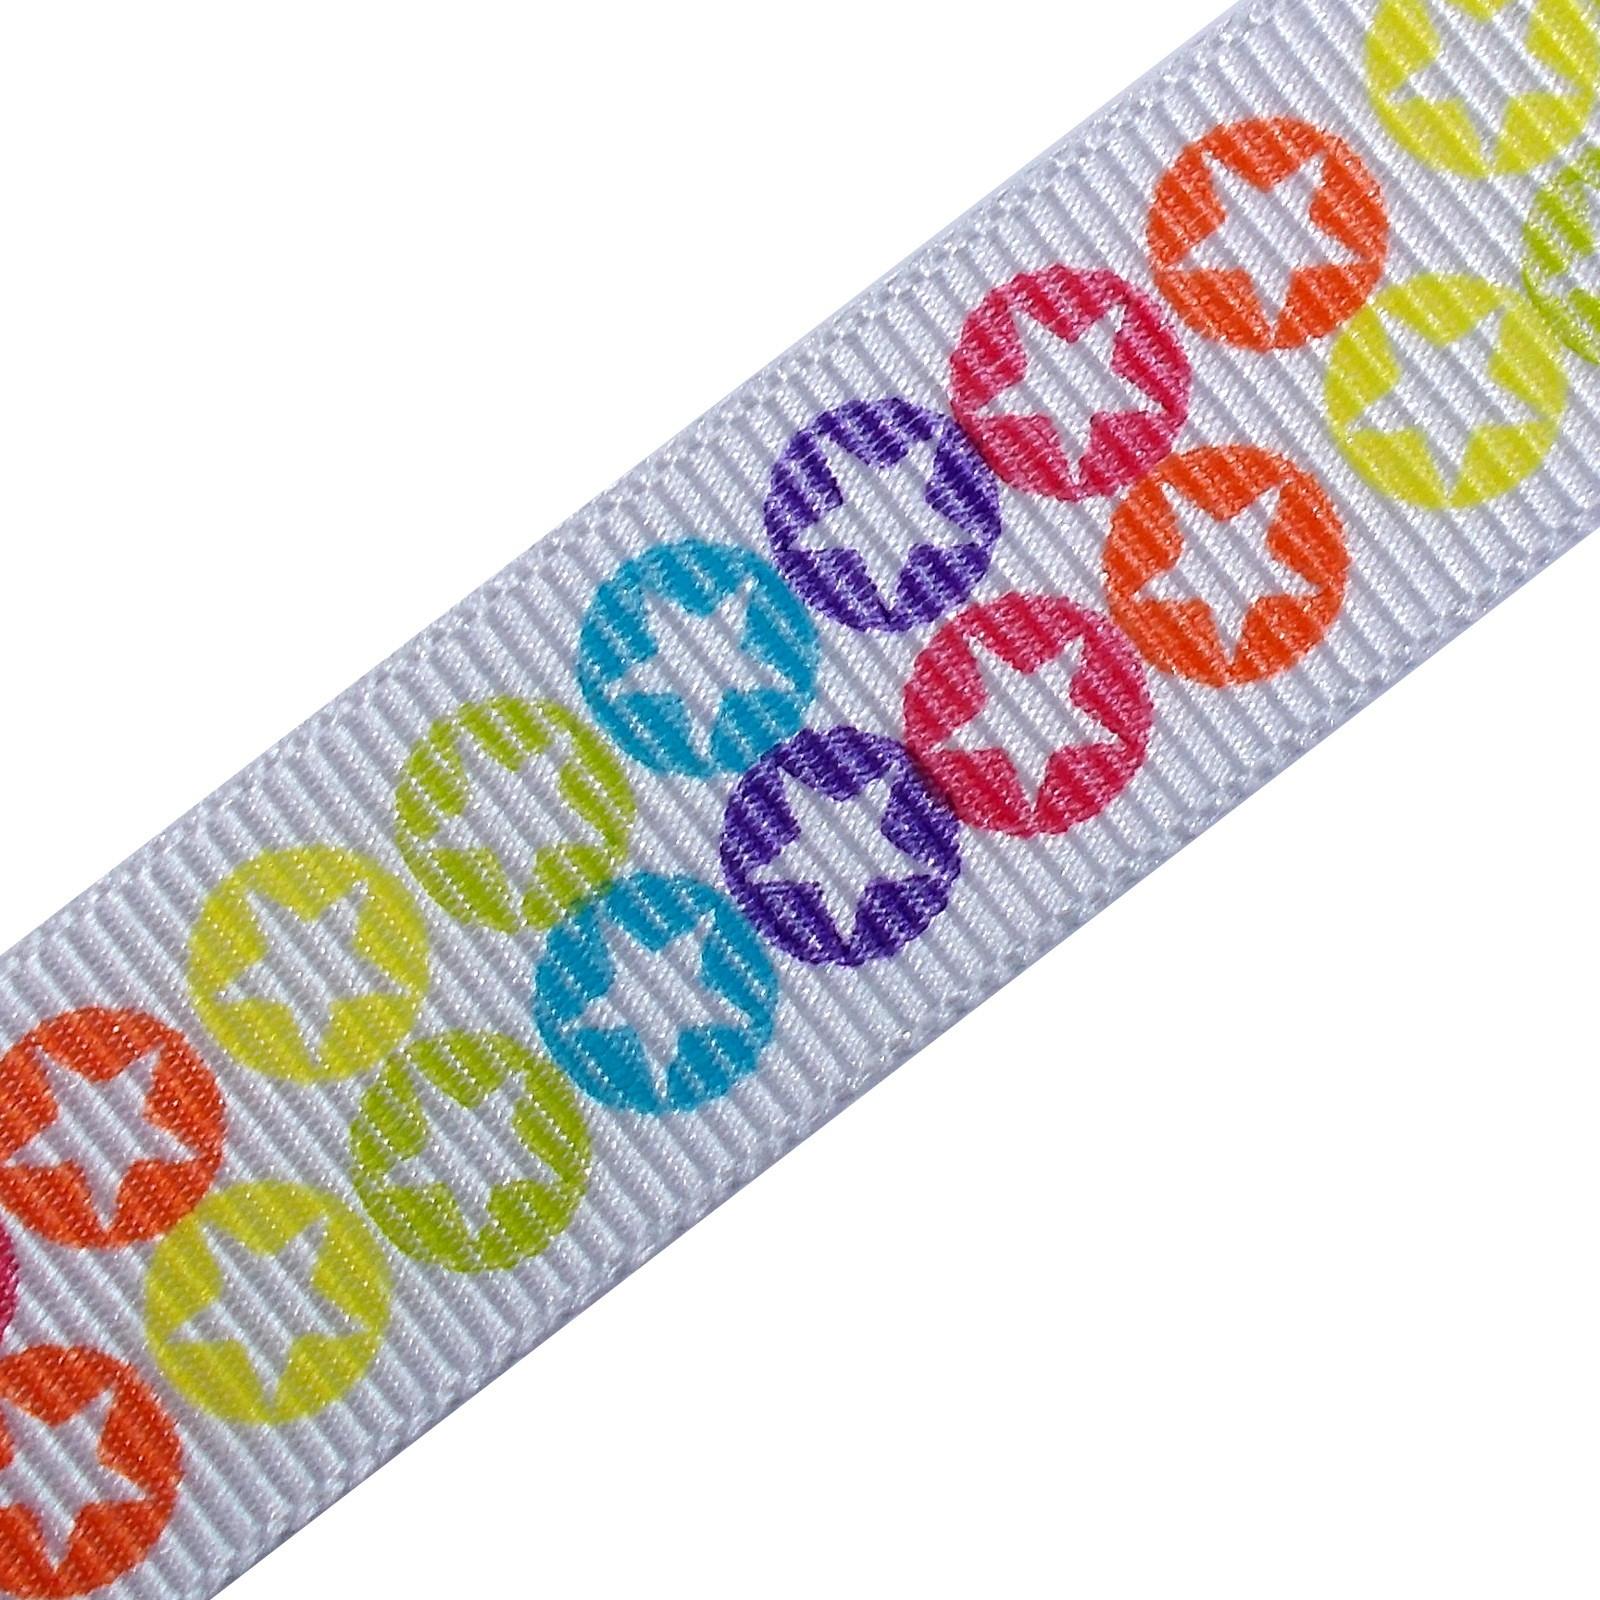 Berisfords Bright Rainbow Grosgrain Ribbon 16mm wide Stars 1 metre length